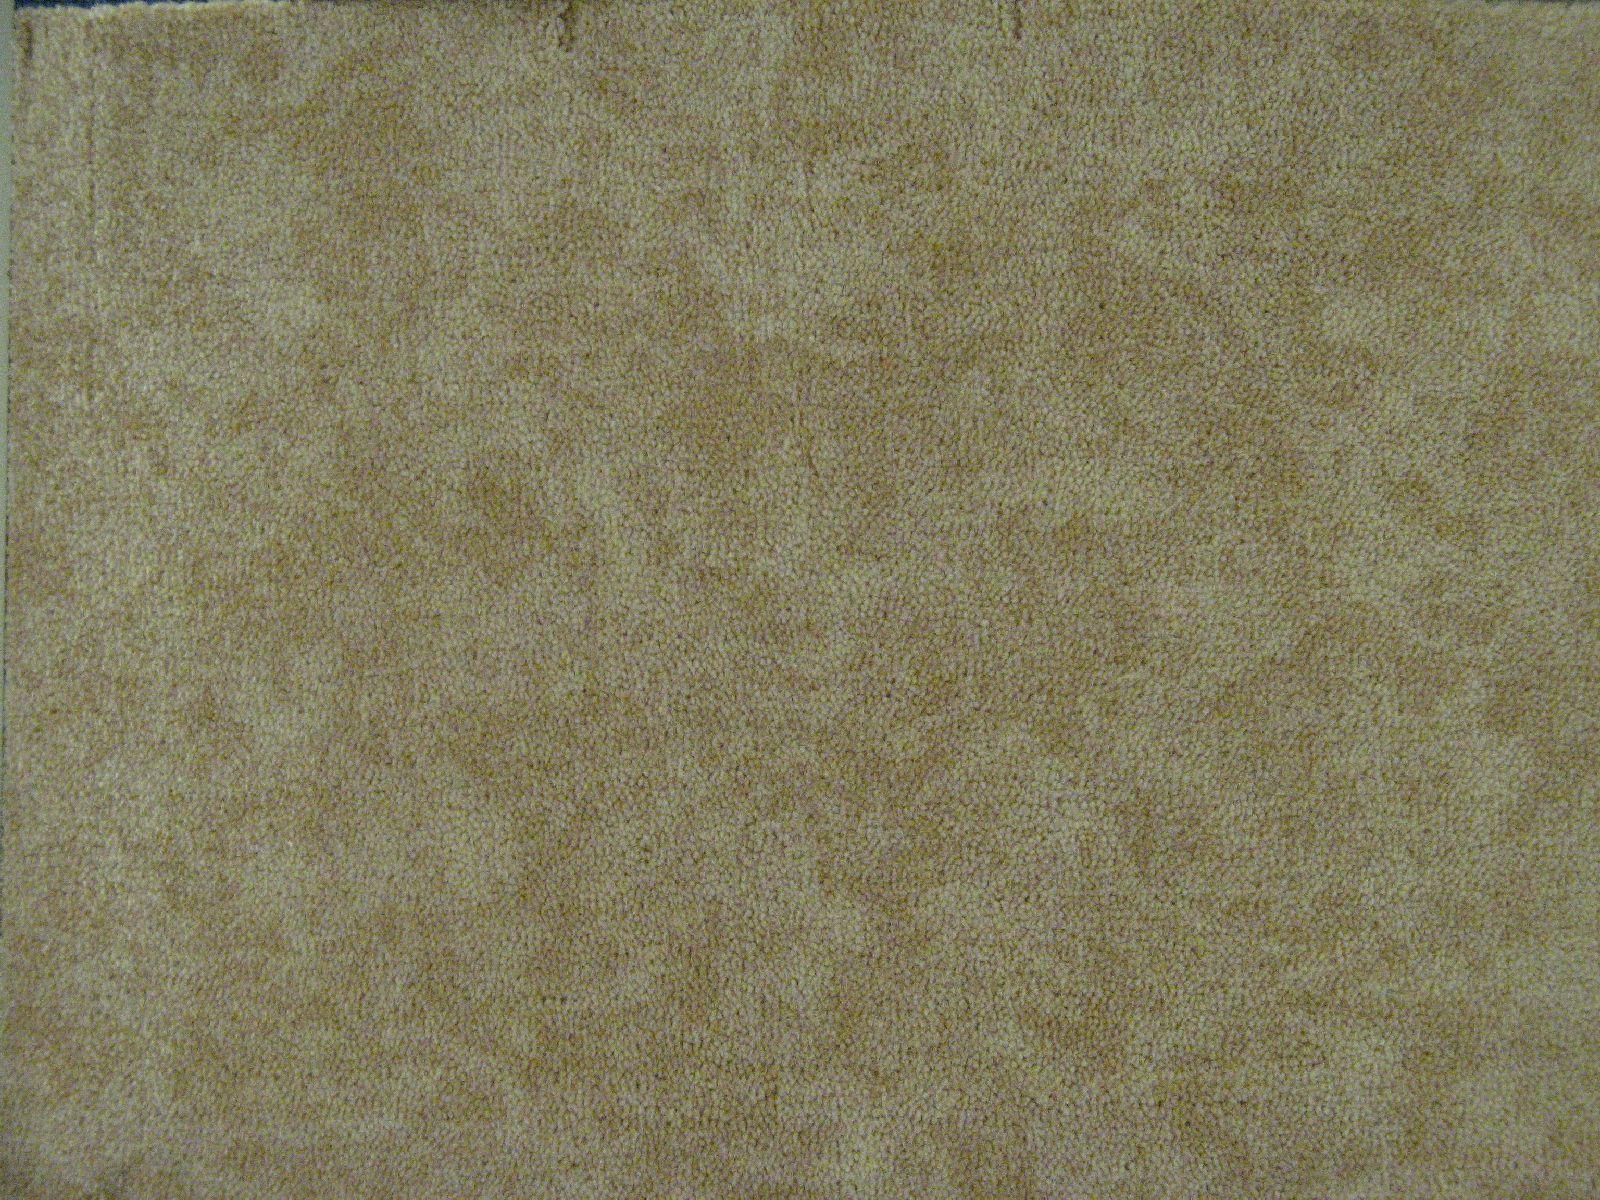 Innenraum-Material_Textur_B_4776